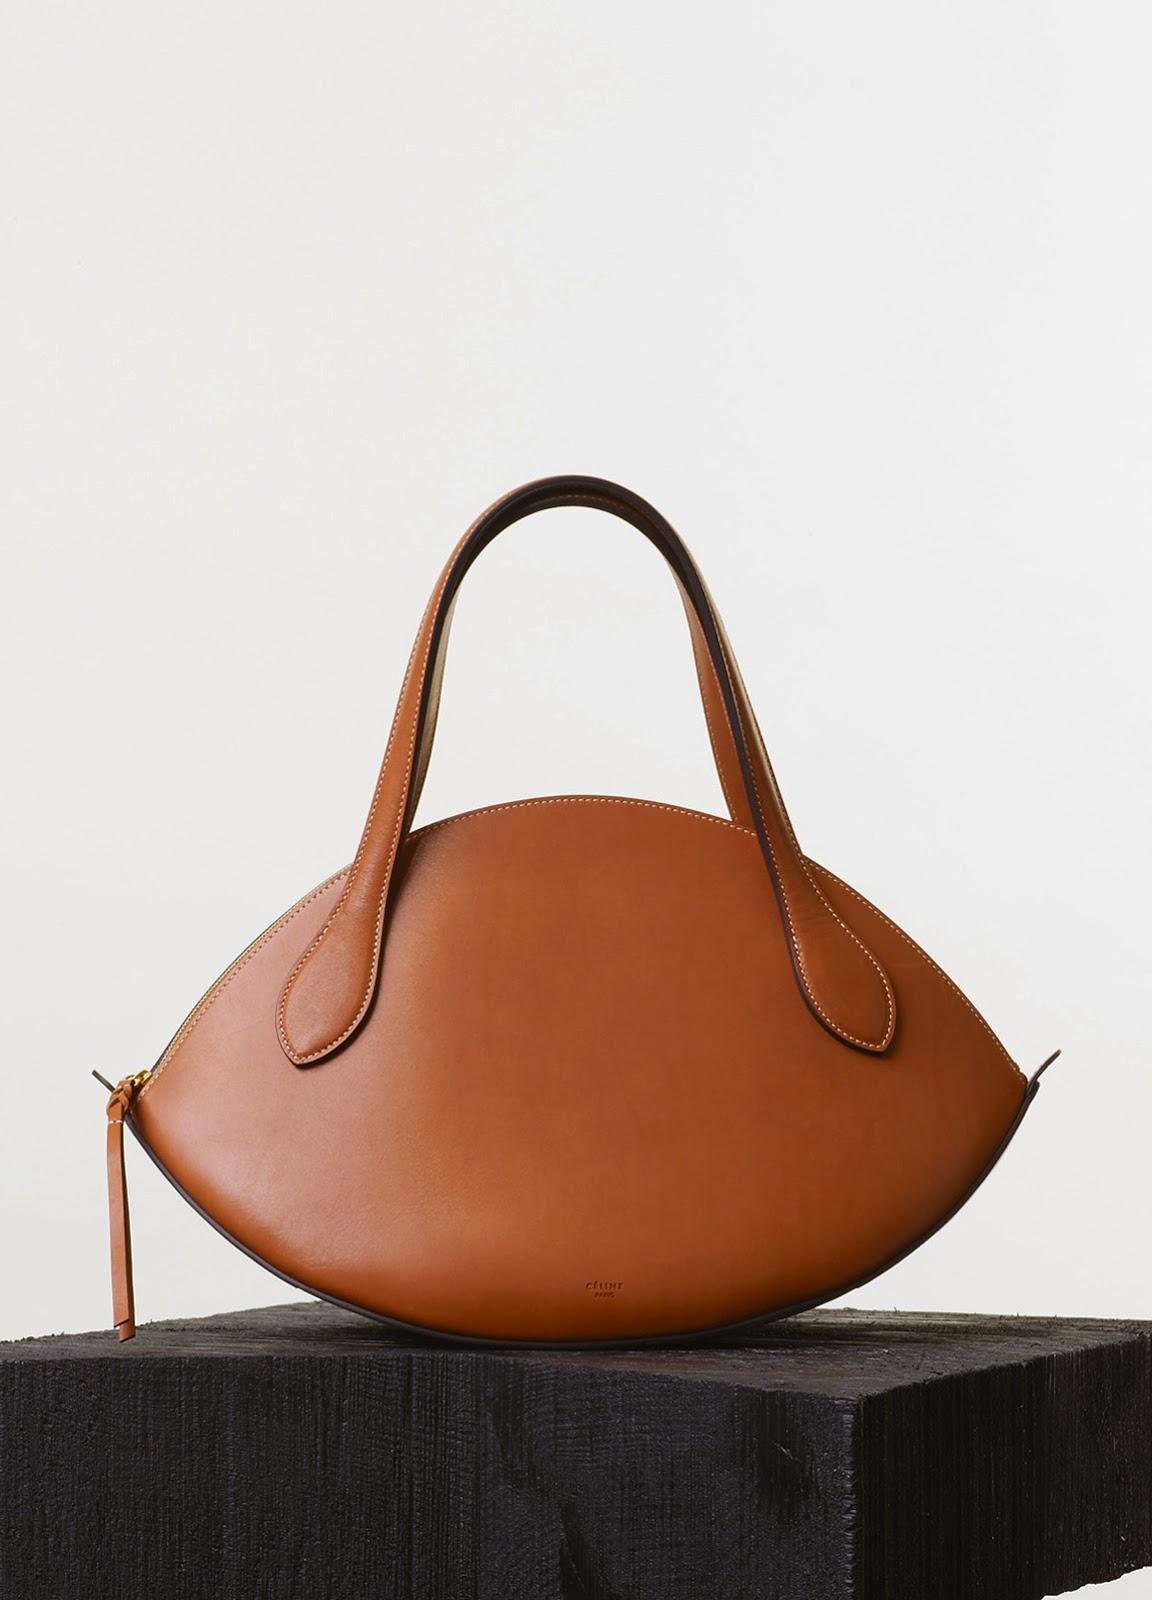 celine mini luggage bag price - BAG\u0026#39;IT: NEW IN CELINE #2 NOUVELLE COLLECTION PRINTEMPS ETE